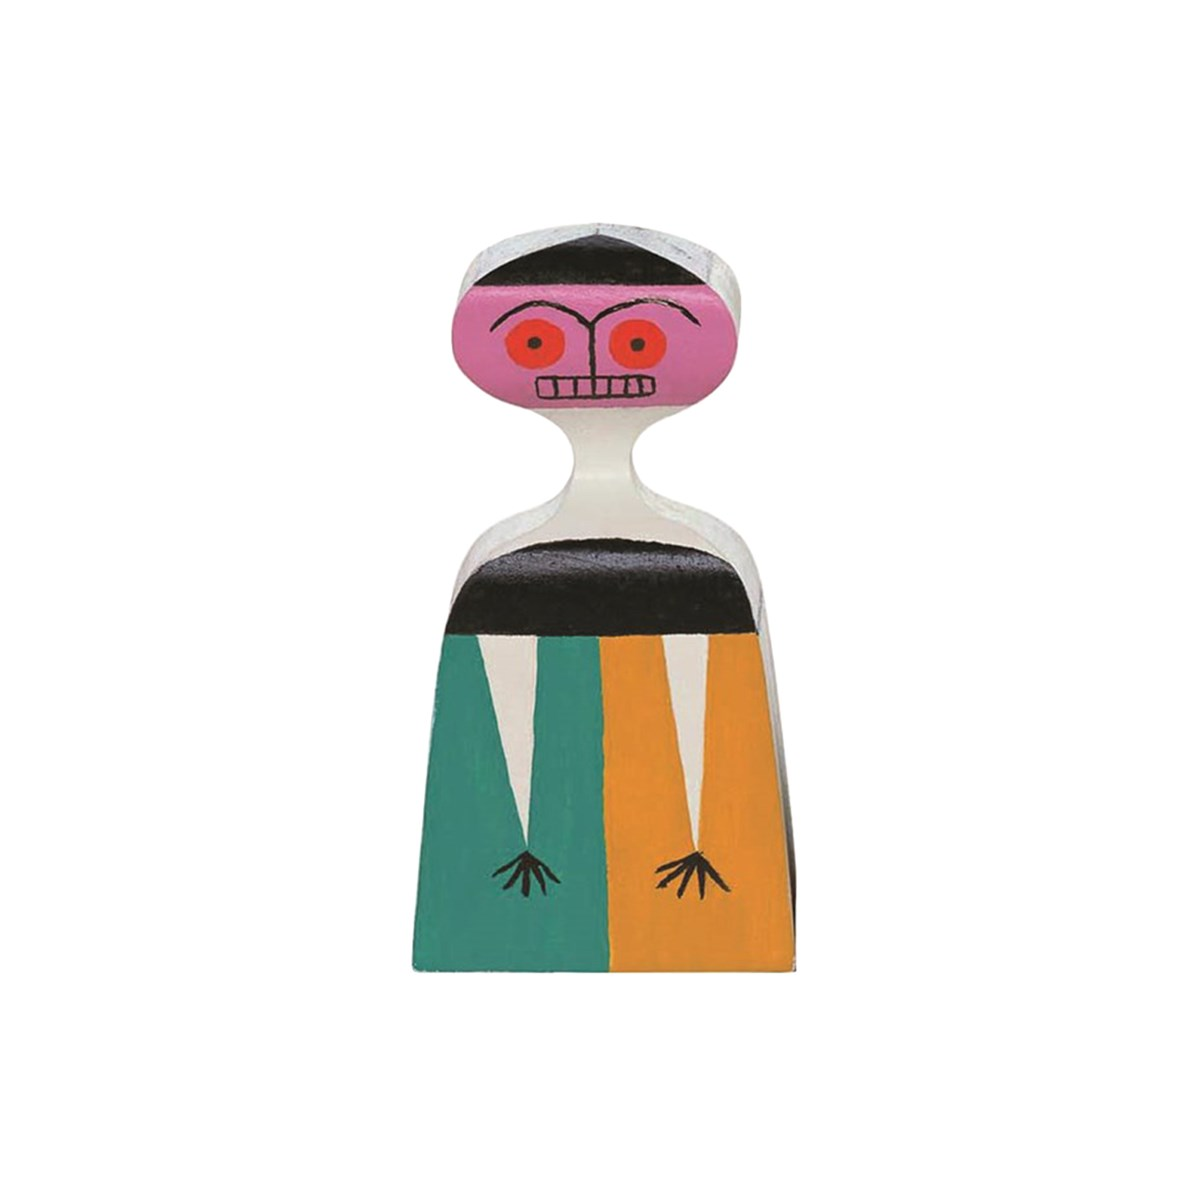 Vitra-Alexander-Girard-Wooden-Doll-No.3-Matisse-1